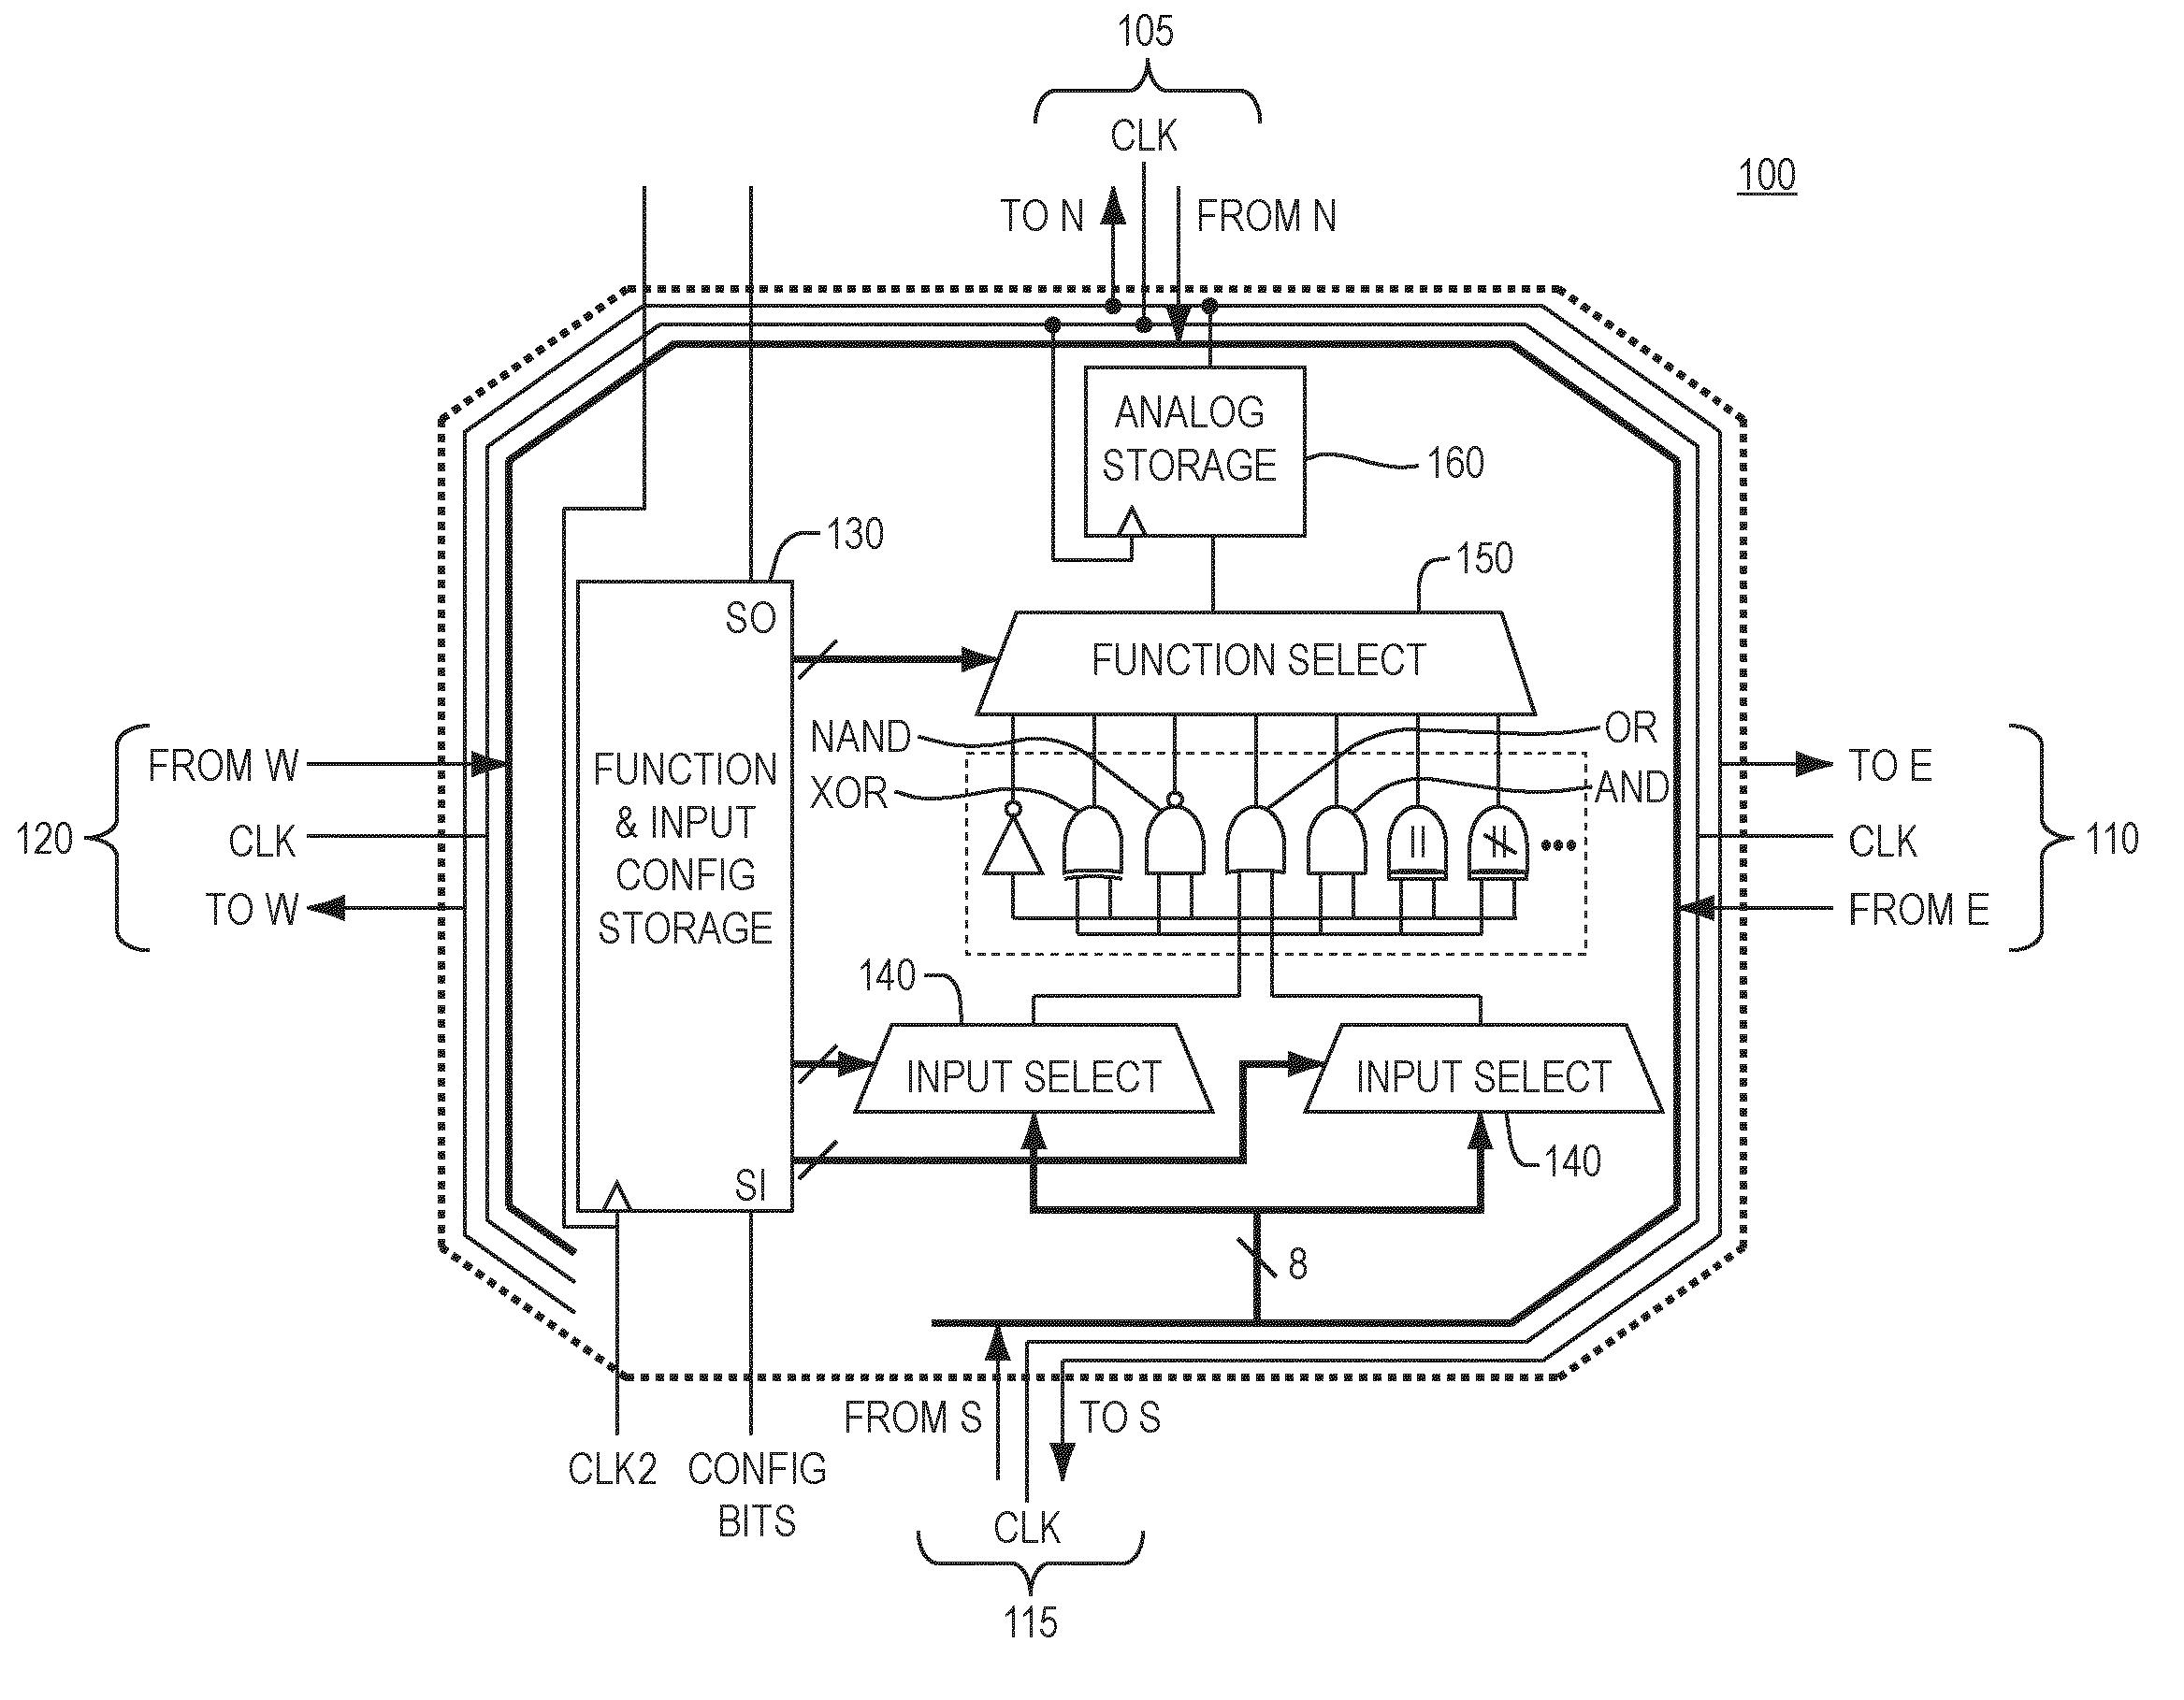 electrical trailer ke wiring diagram 1b1e95b wiring diagram for case 580 super k wiring resources  wiring diagram for case 580 super k